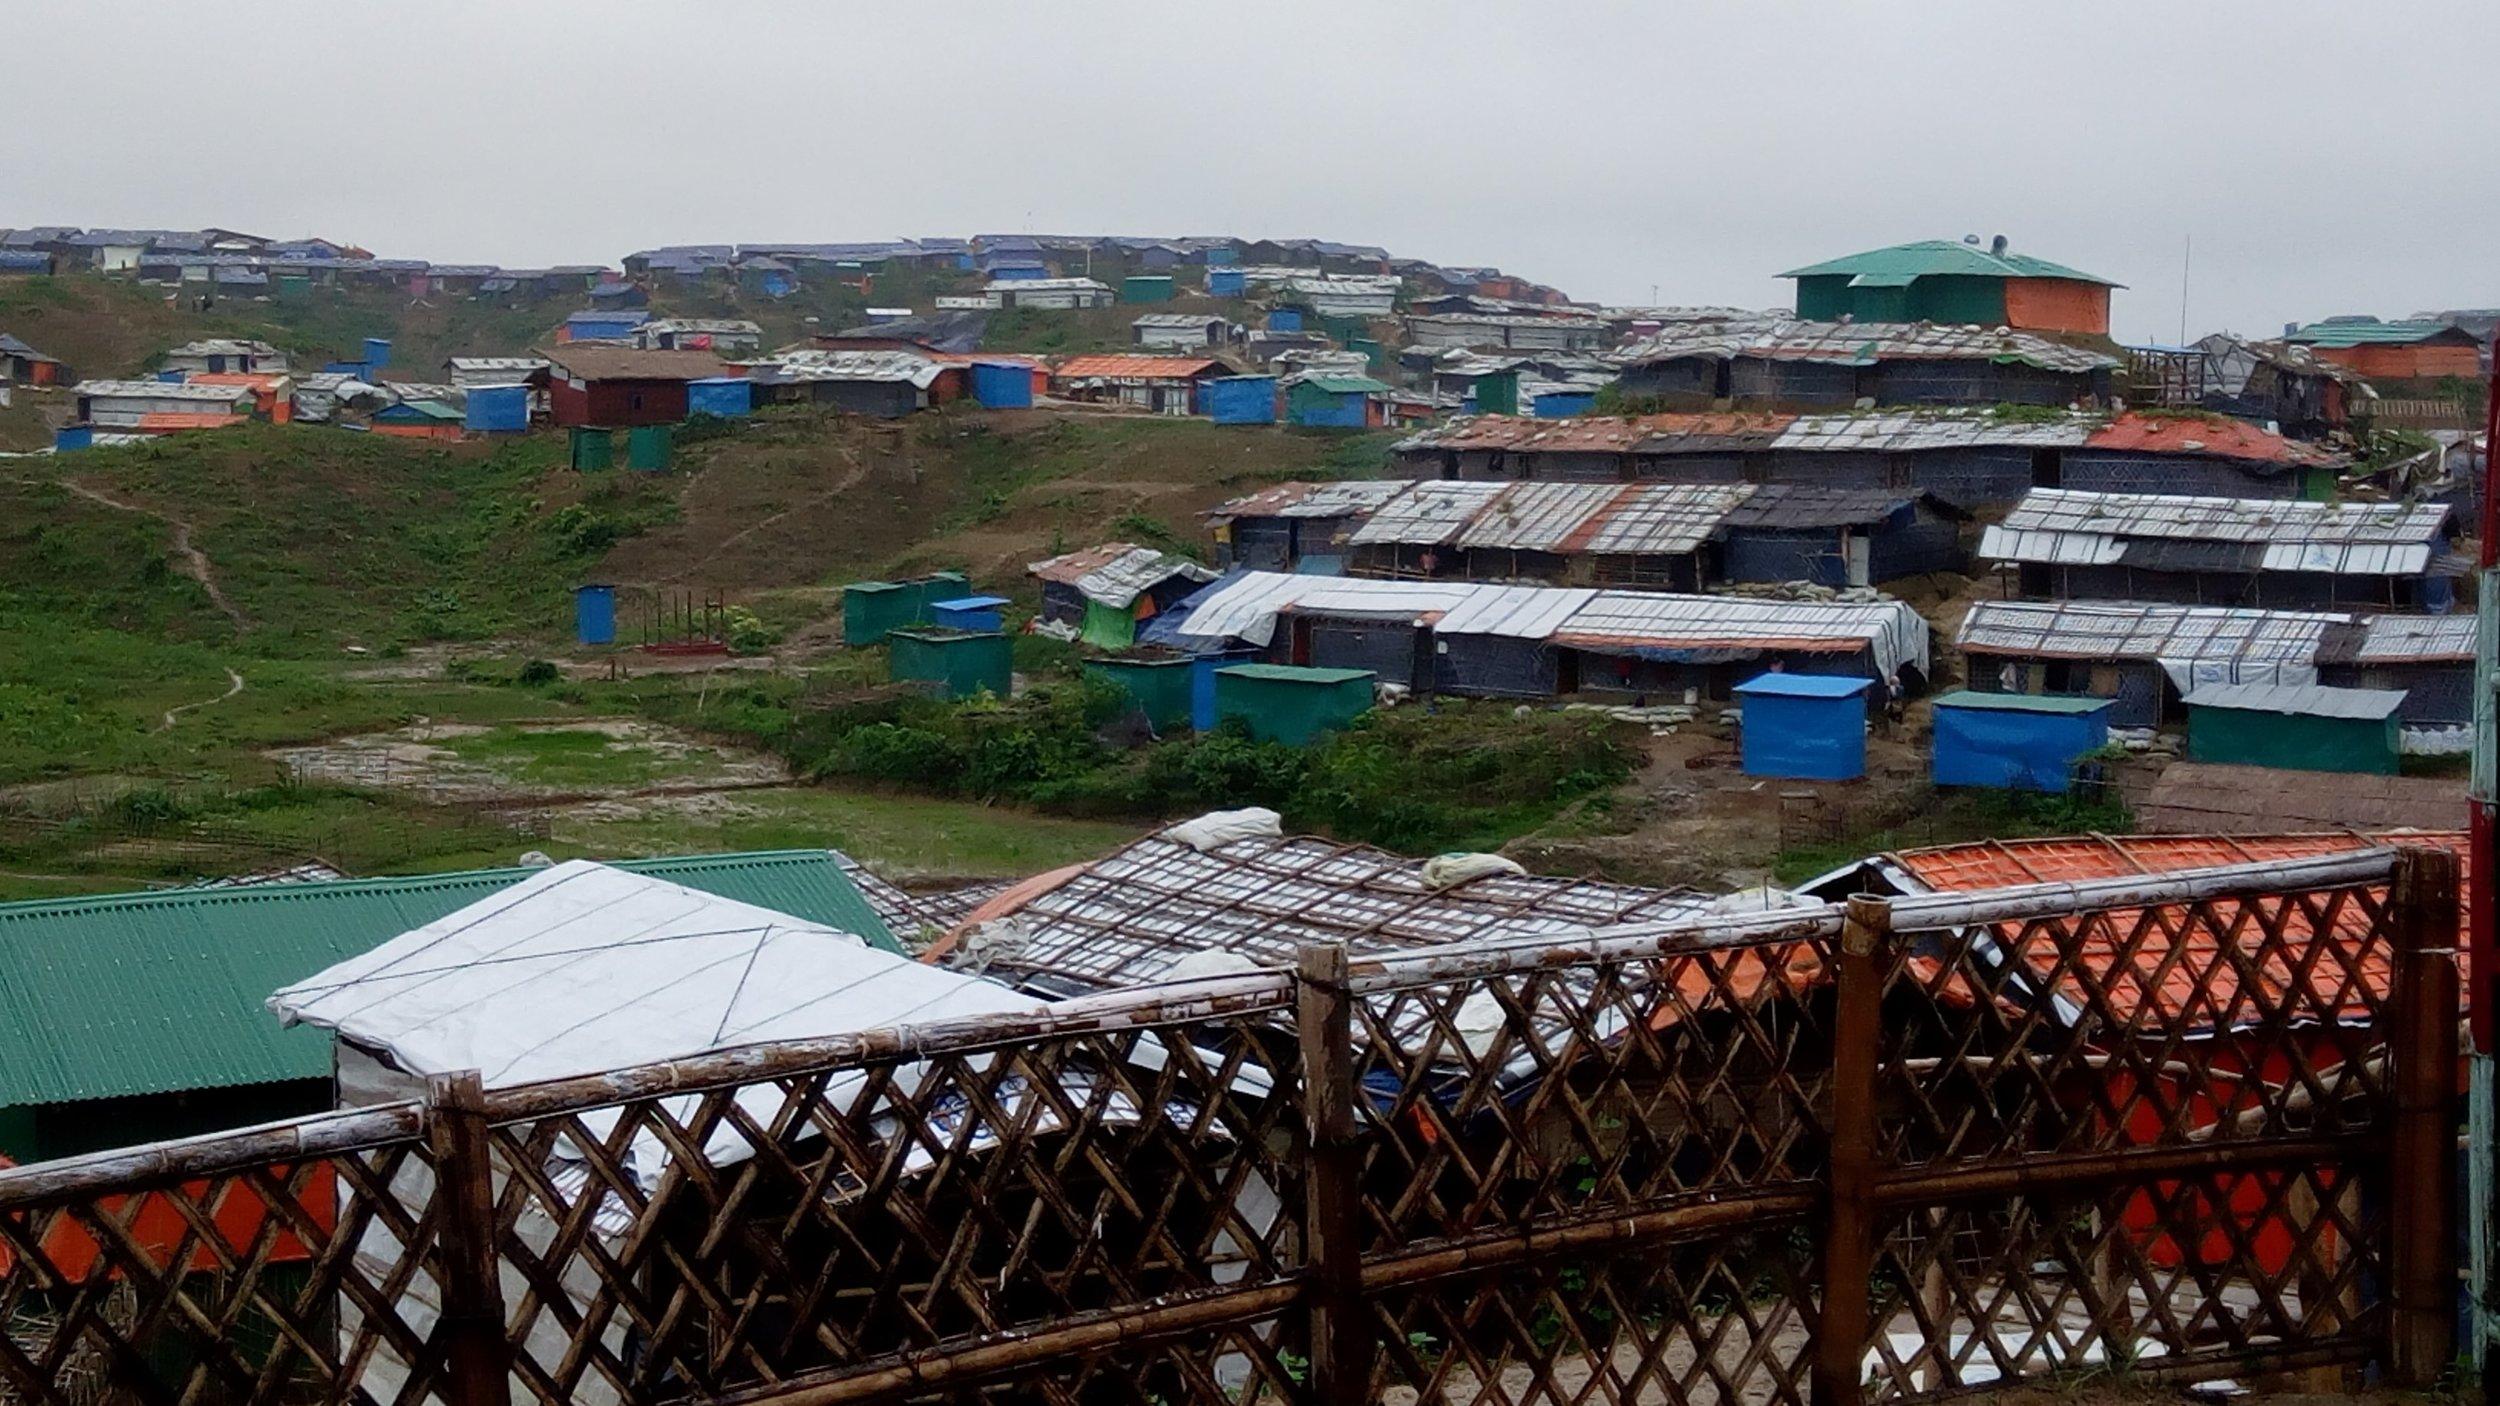 Jamtoli refugee camp in Cox's Bazar, Bangladesh